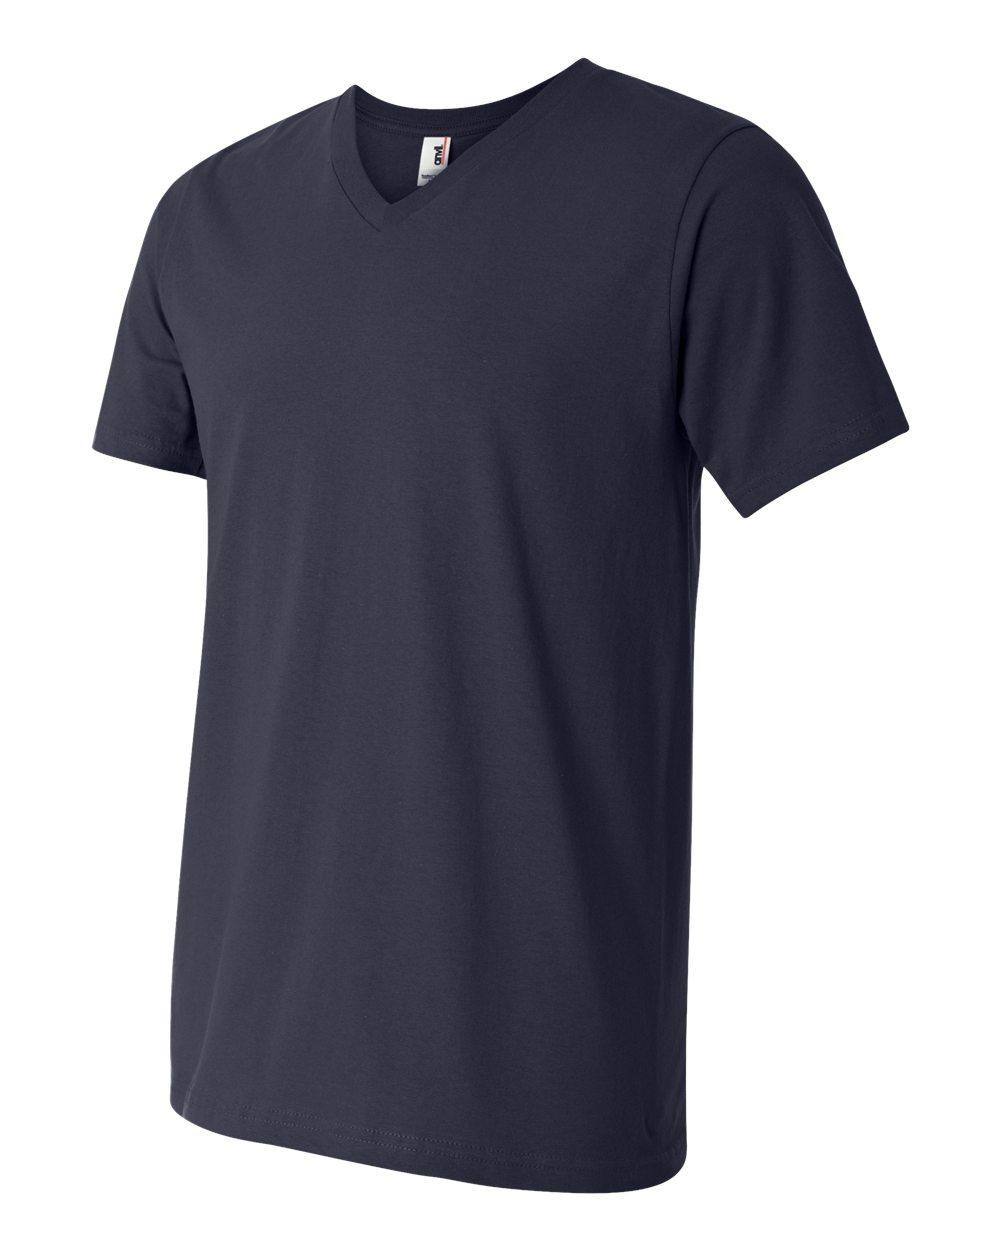 Anvil-Men-039-s-Lightweight-V-Neck-T-Shirt-982-S-3XL thumbnail 18